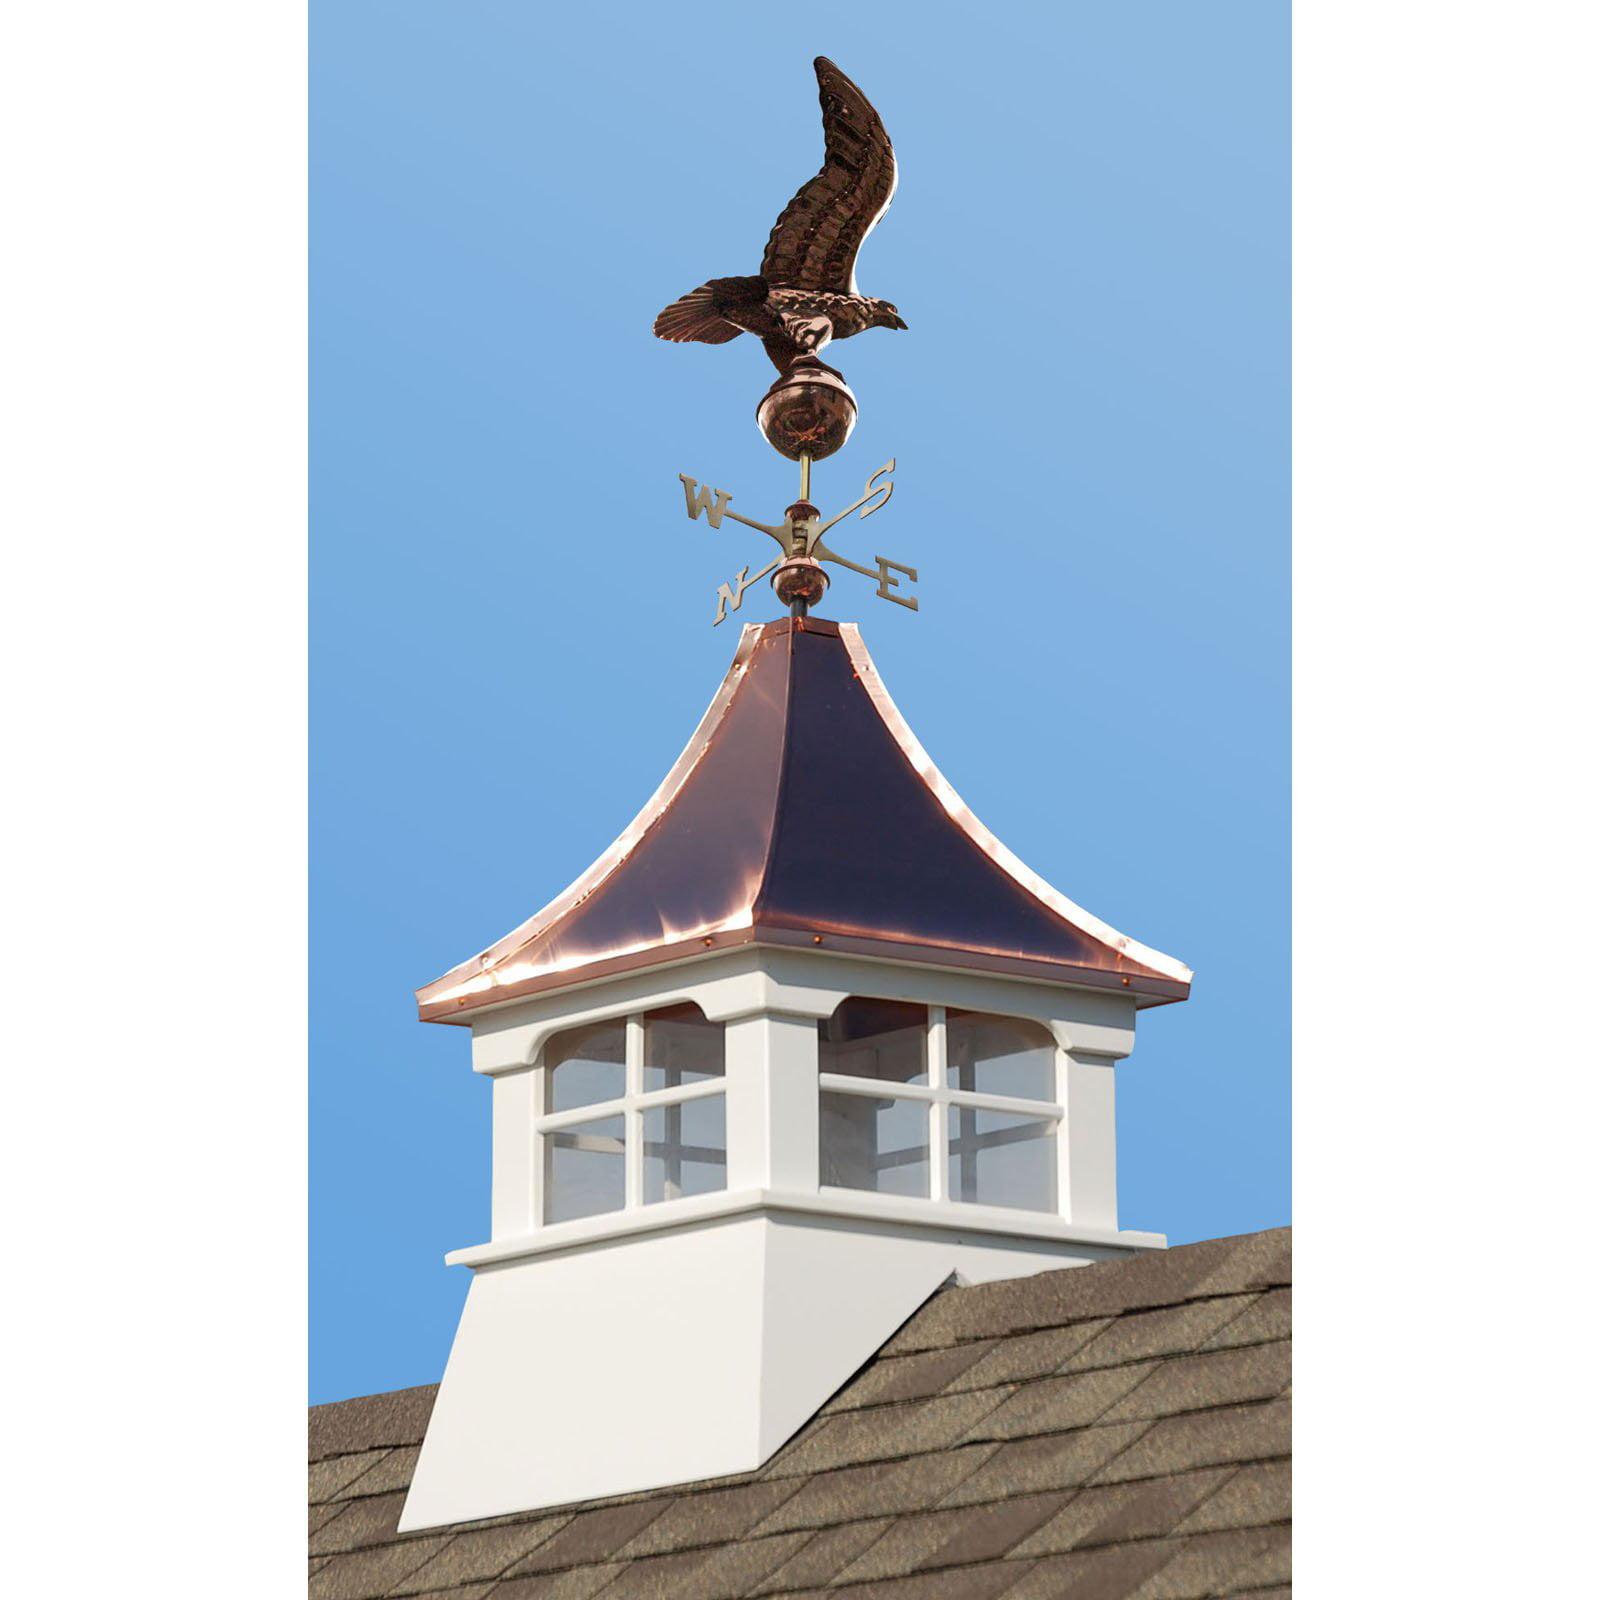 Accentua Charleston Cupola with Eagle Weathervane by Accentua LLC